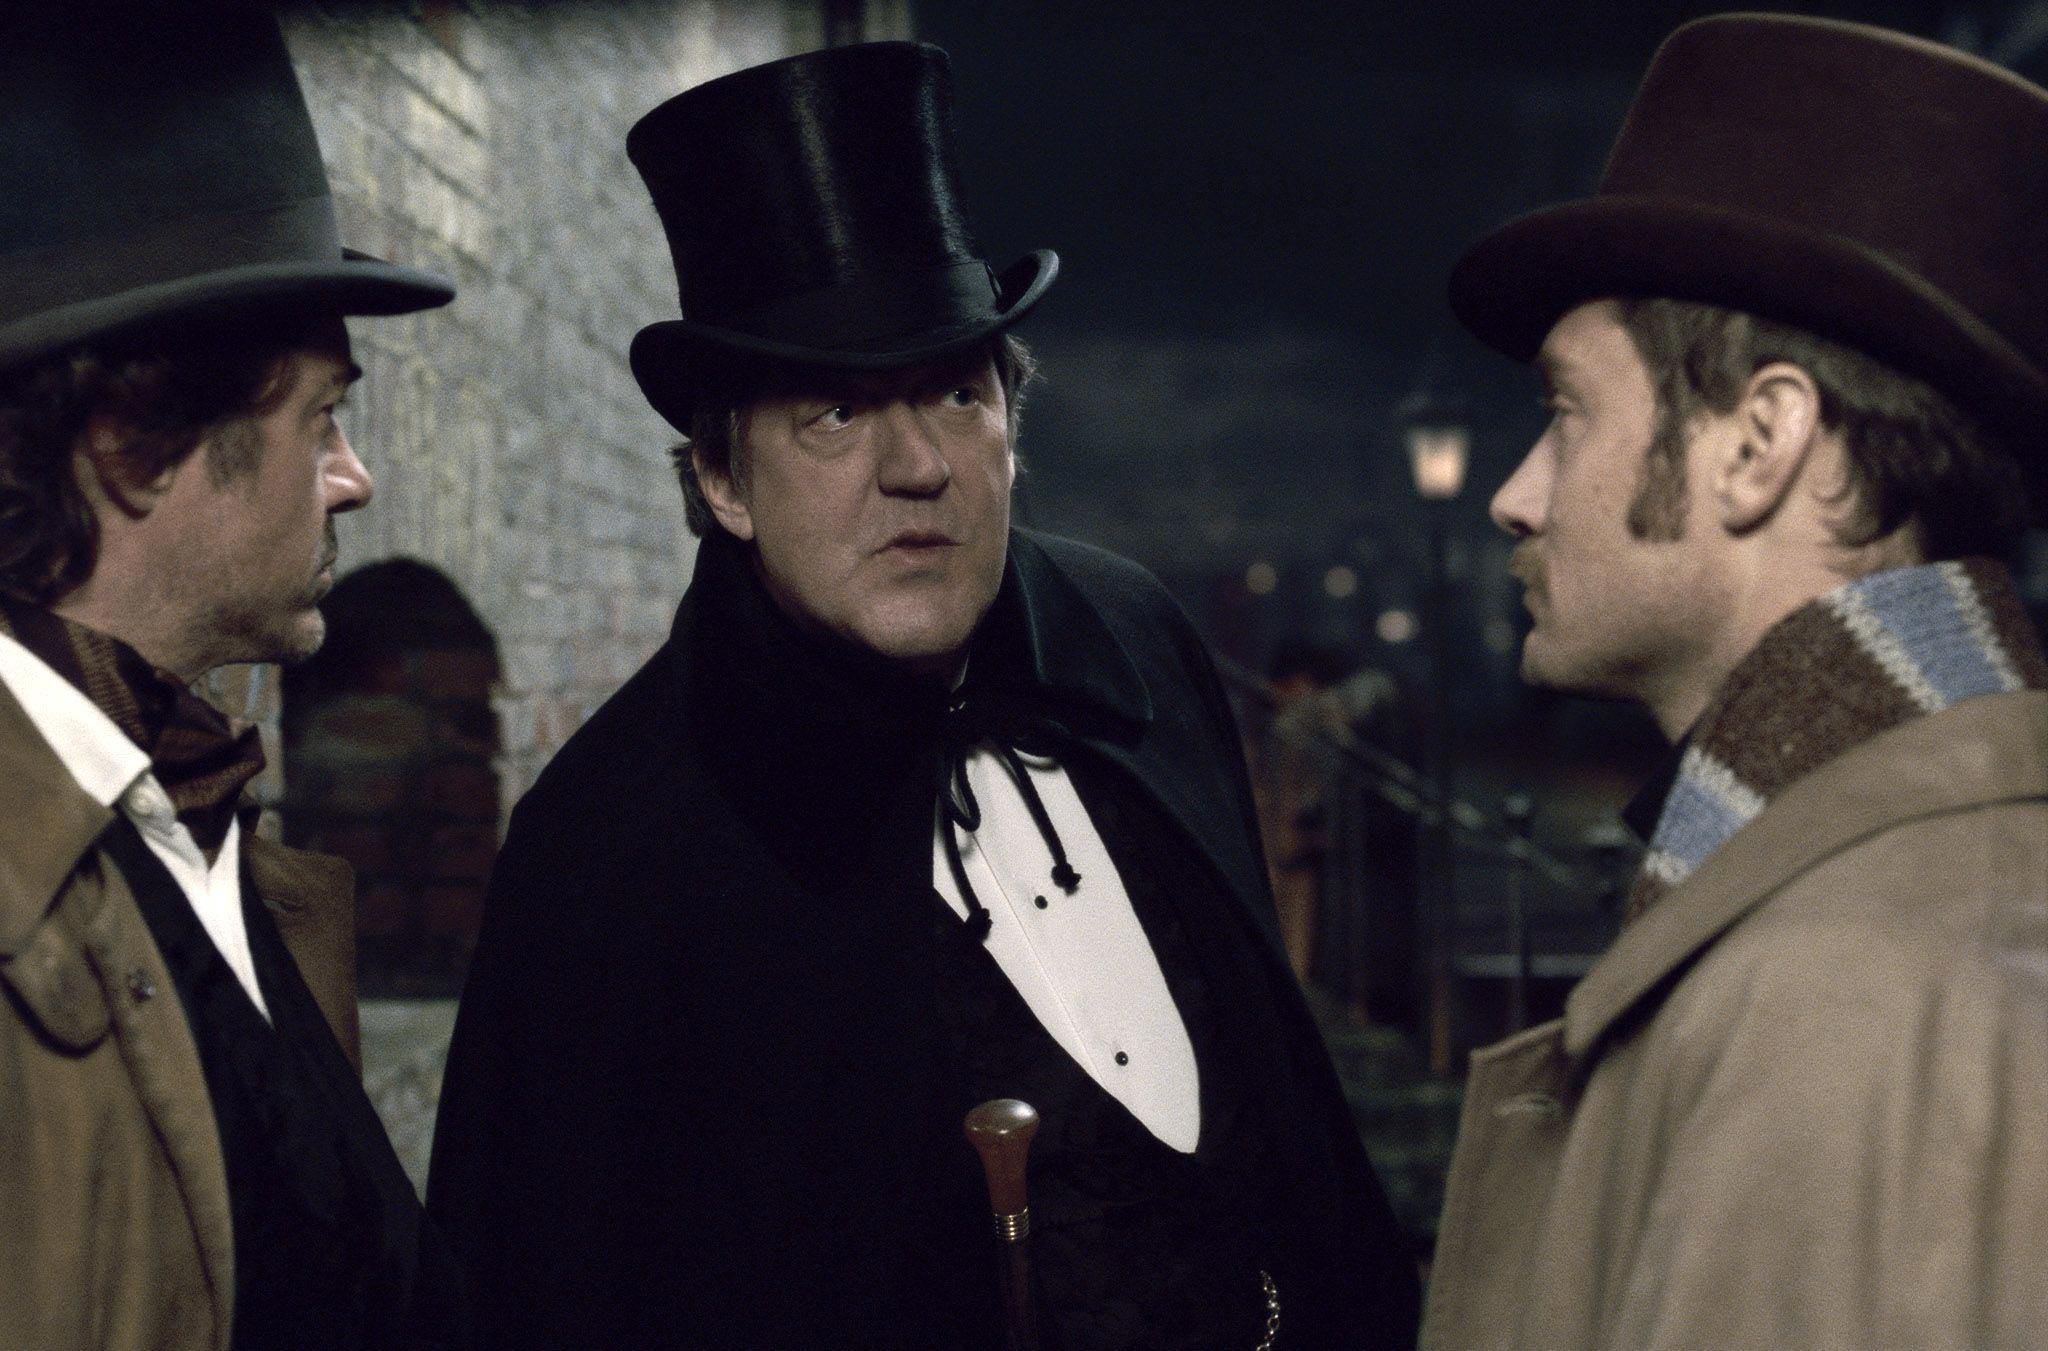 https://i0.wp.com/www.filmofilia.com/wp-content/uploads/2011/12/SHERLOCK-HOLMES_2_25.jpg